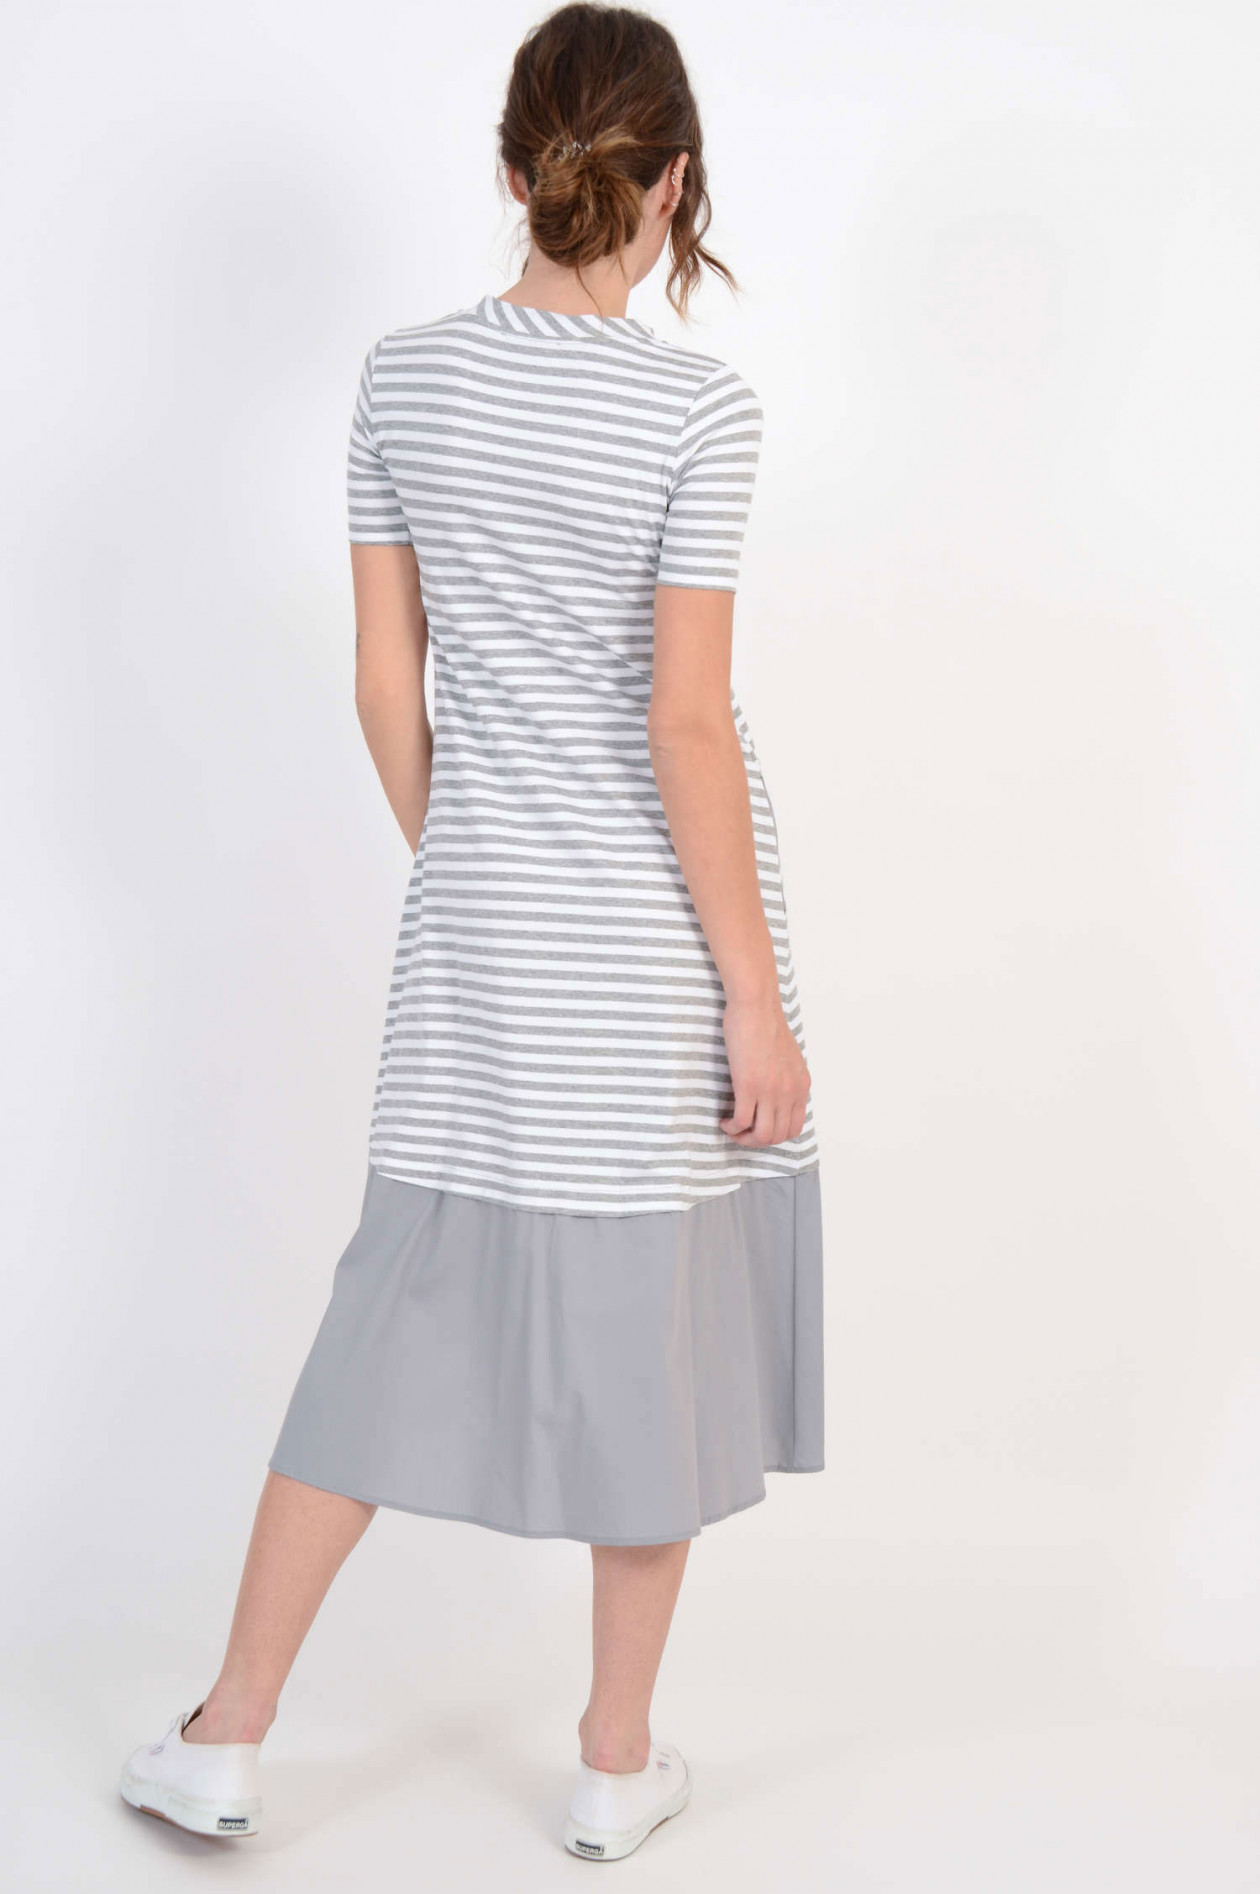 promo code 61bec 9e0e4 Vokuhila - Kleid mit Streifen in Grau/Weiß